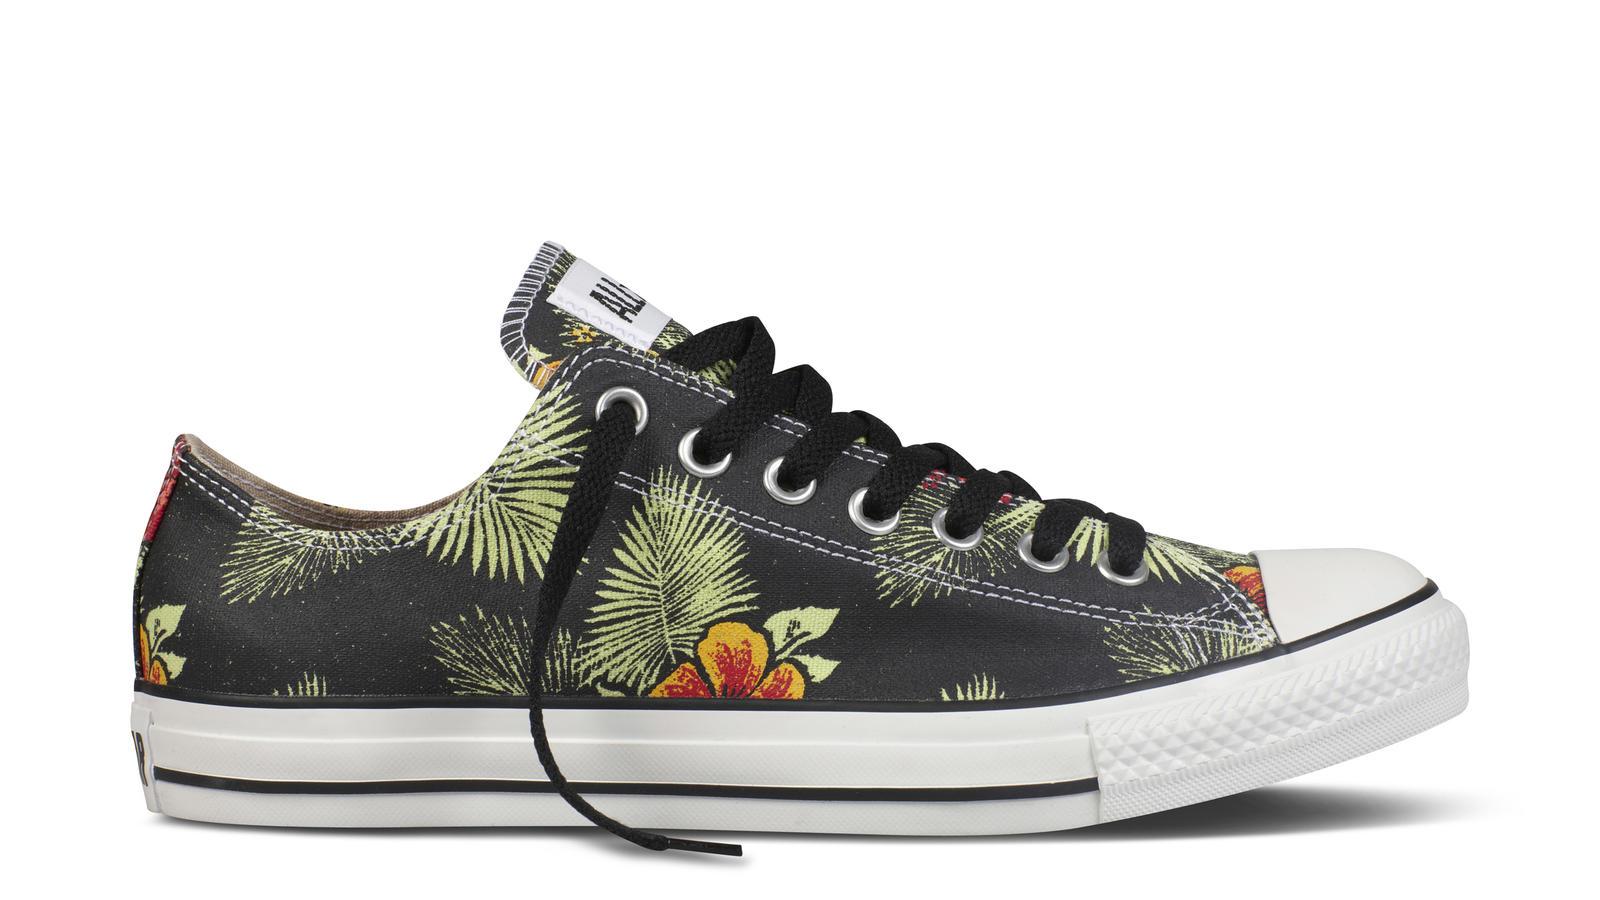 2e4b42b98197 Converse Launches Its Spring Summer 2013 All Star Footwear ...